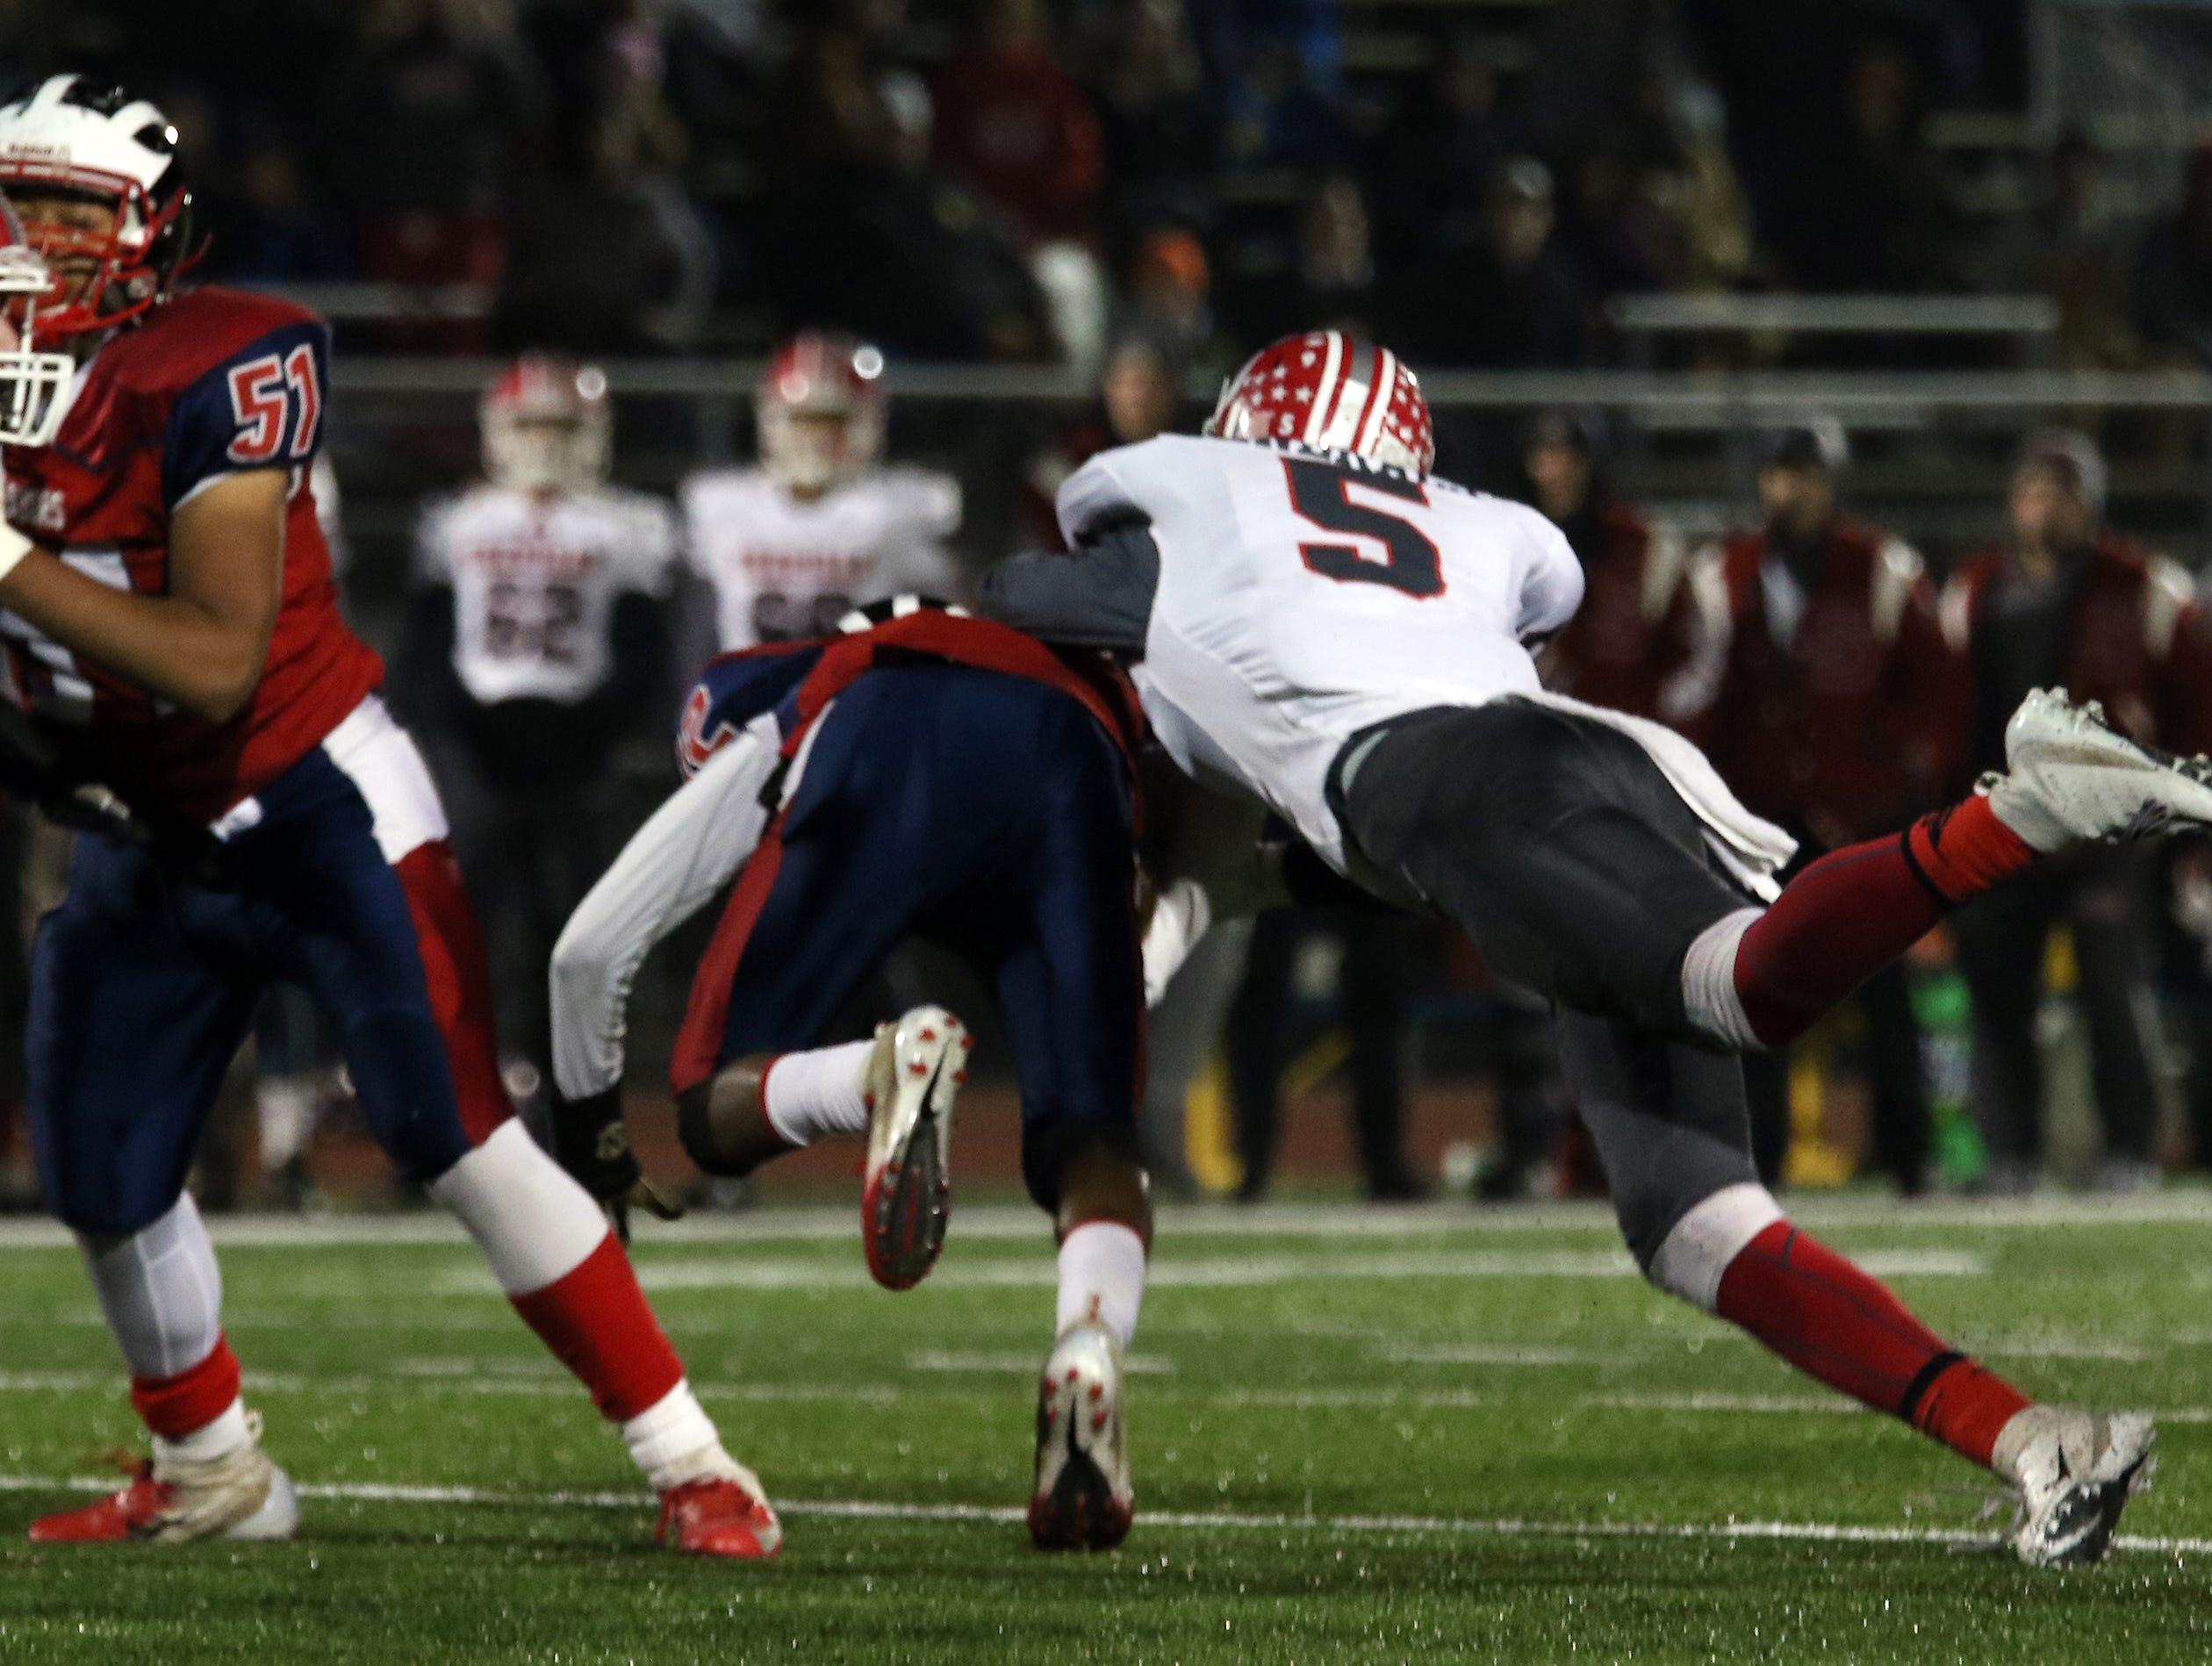 Sheridan's Shay Taylor sacks Eastmoor's quarterback.